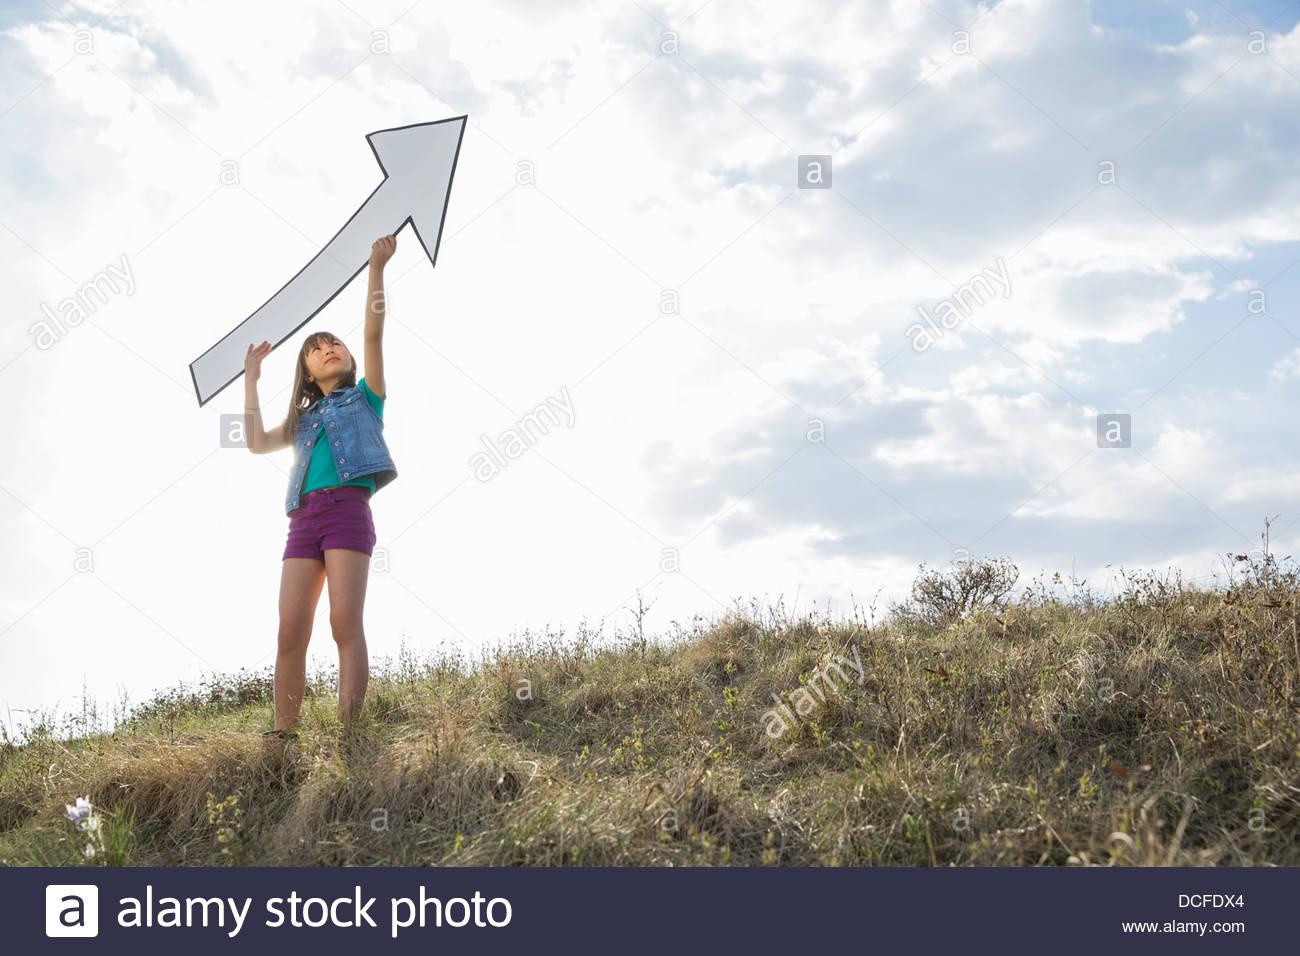 Schoolgirl holding upward arrow outdoors - Stock Image